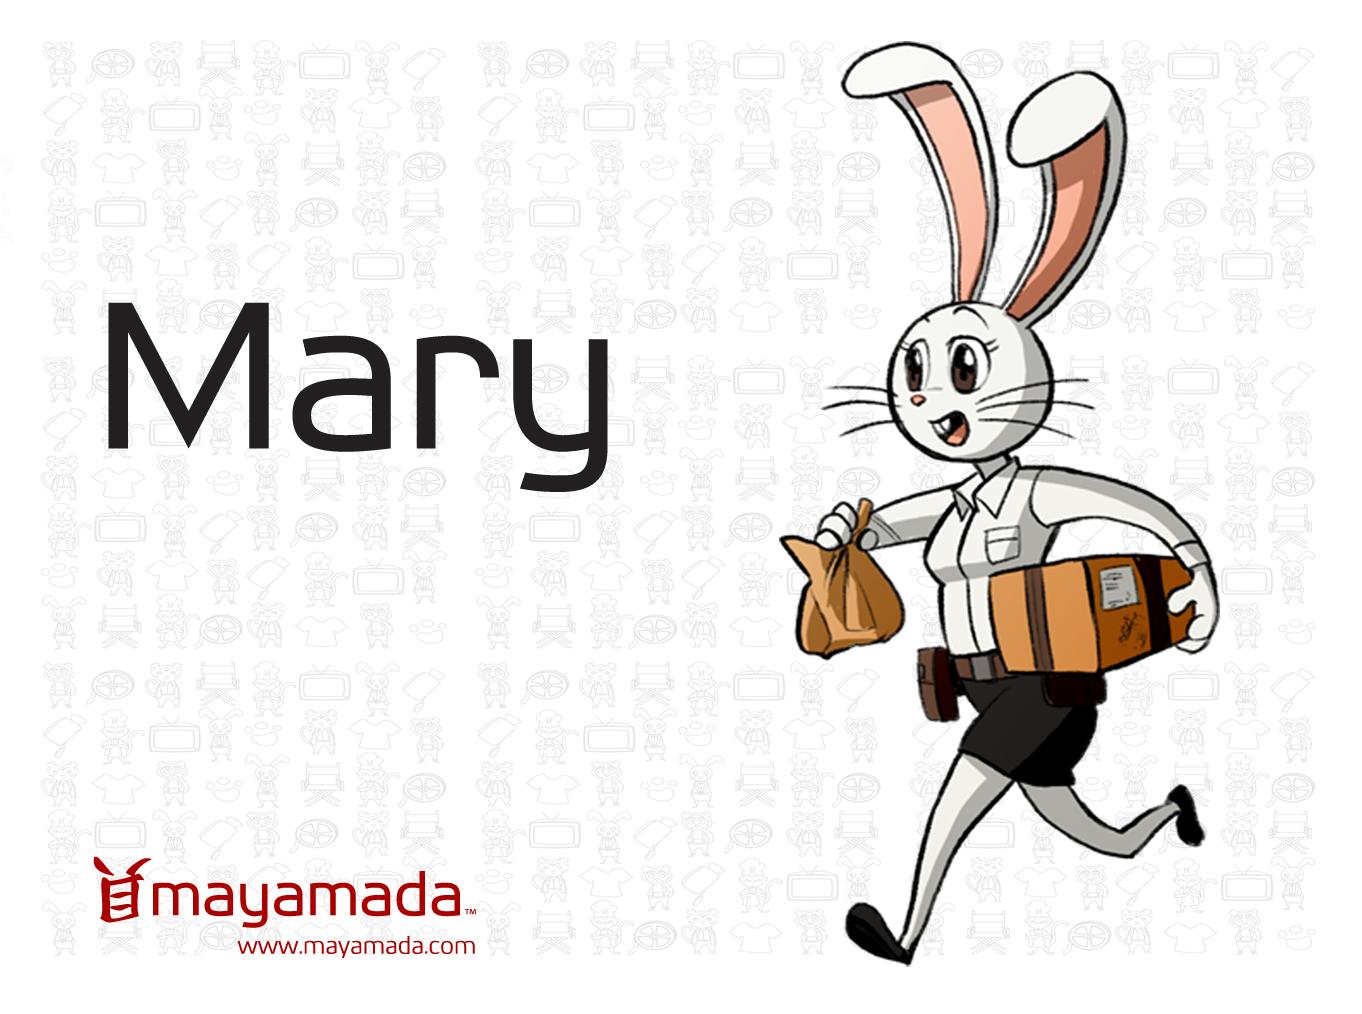 new char mary samurai chef kickstarter